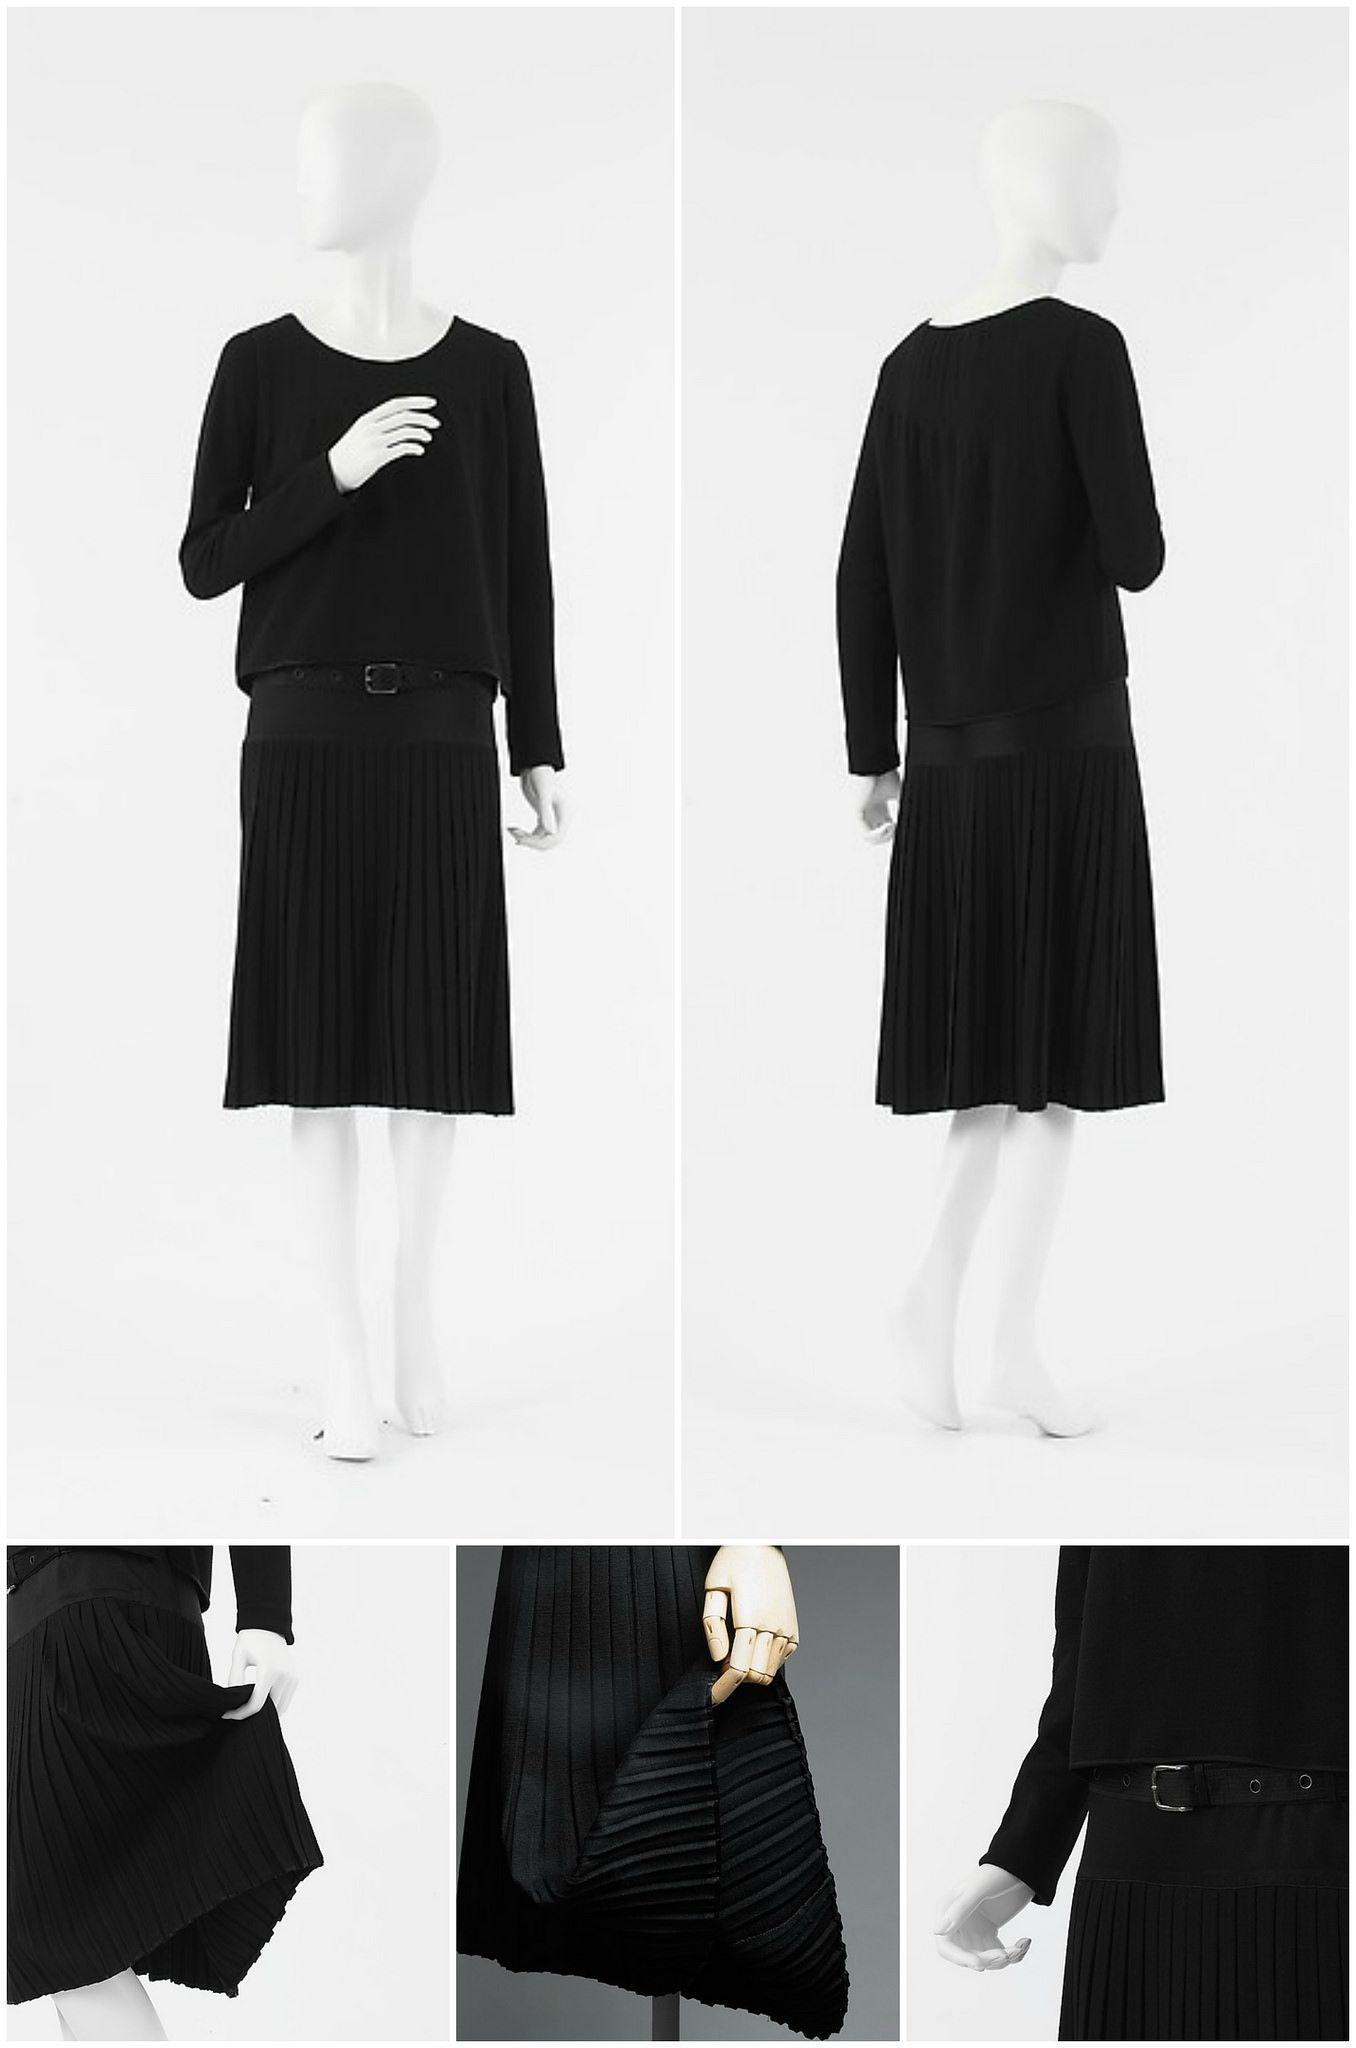 1926 Chanel Little Black Dress Metmuseum